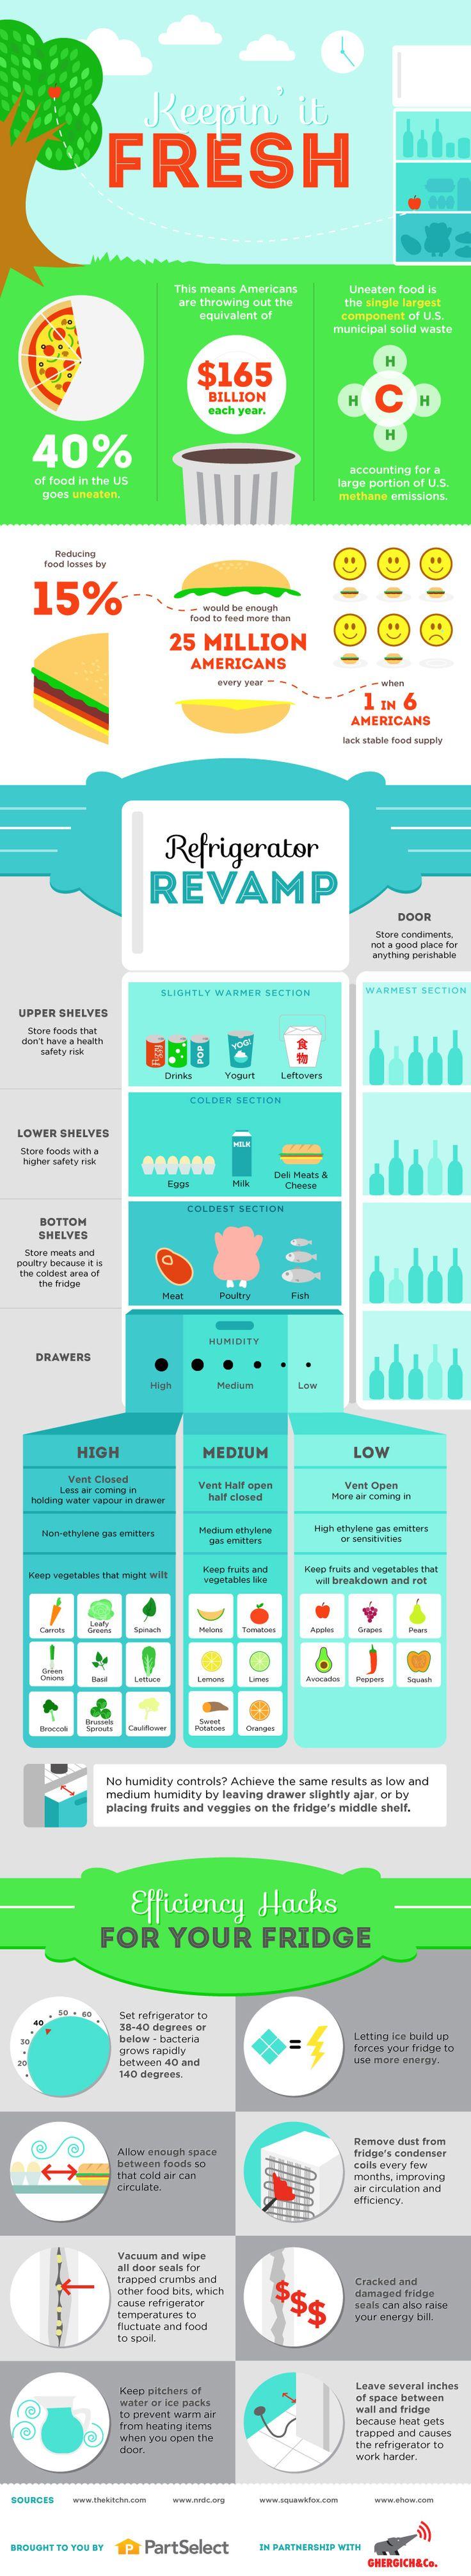 13 best Food Waste images on Pinterest | Cooking tips, Food network ...